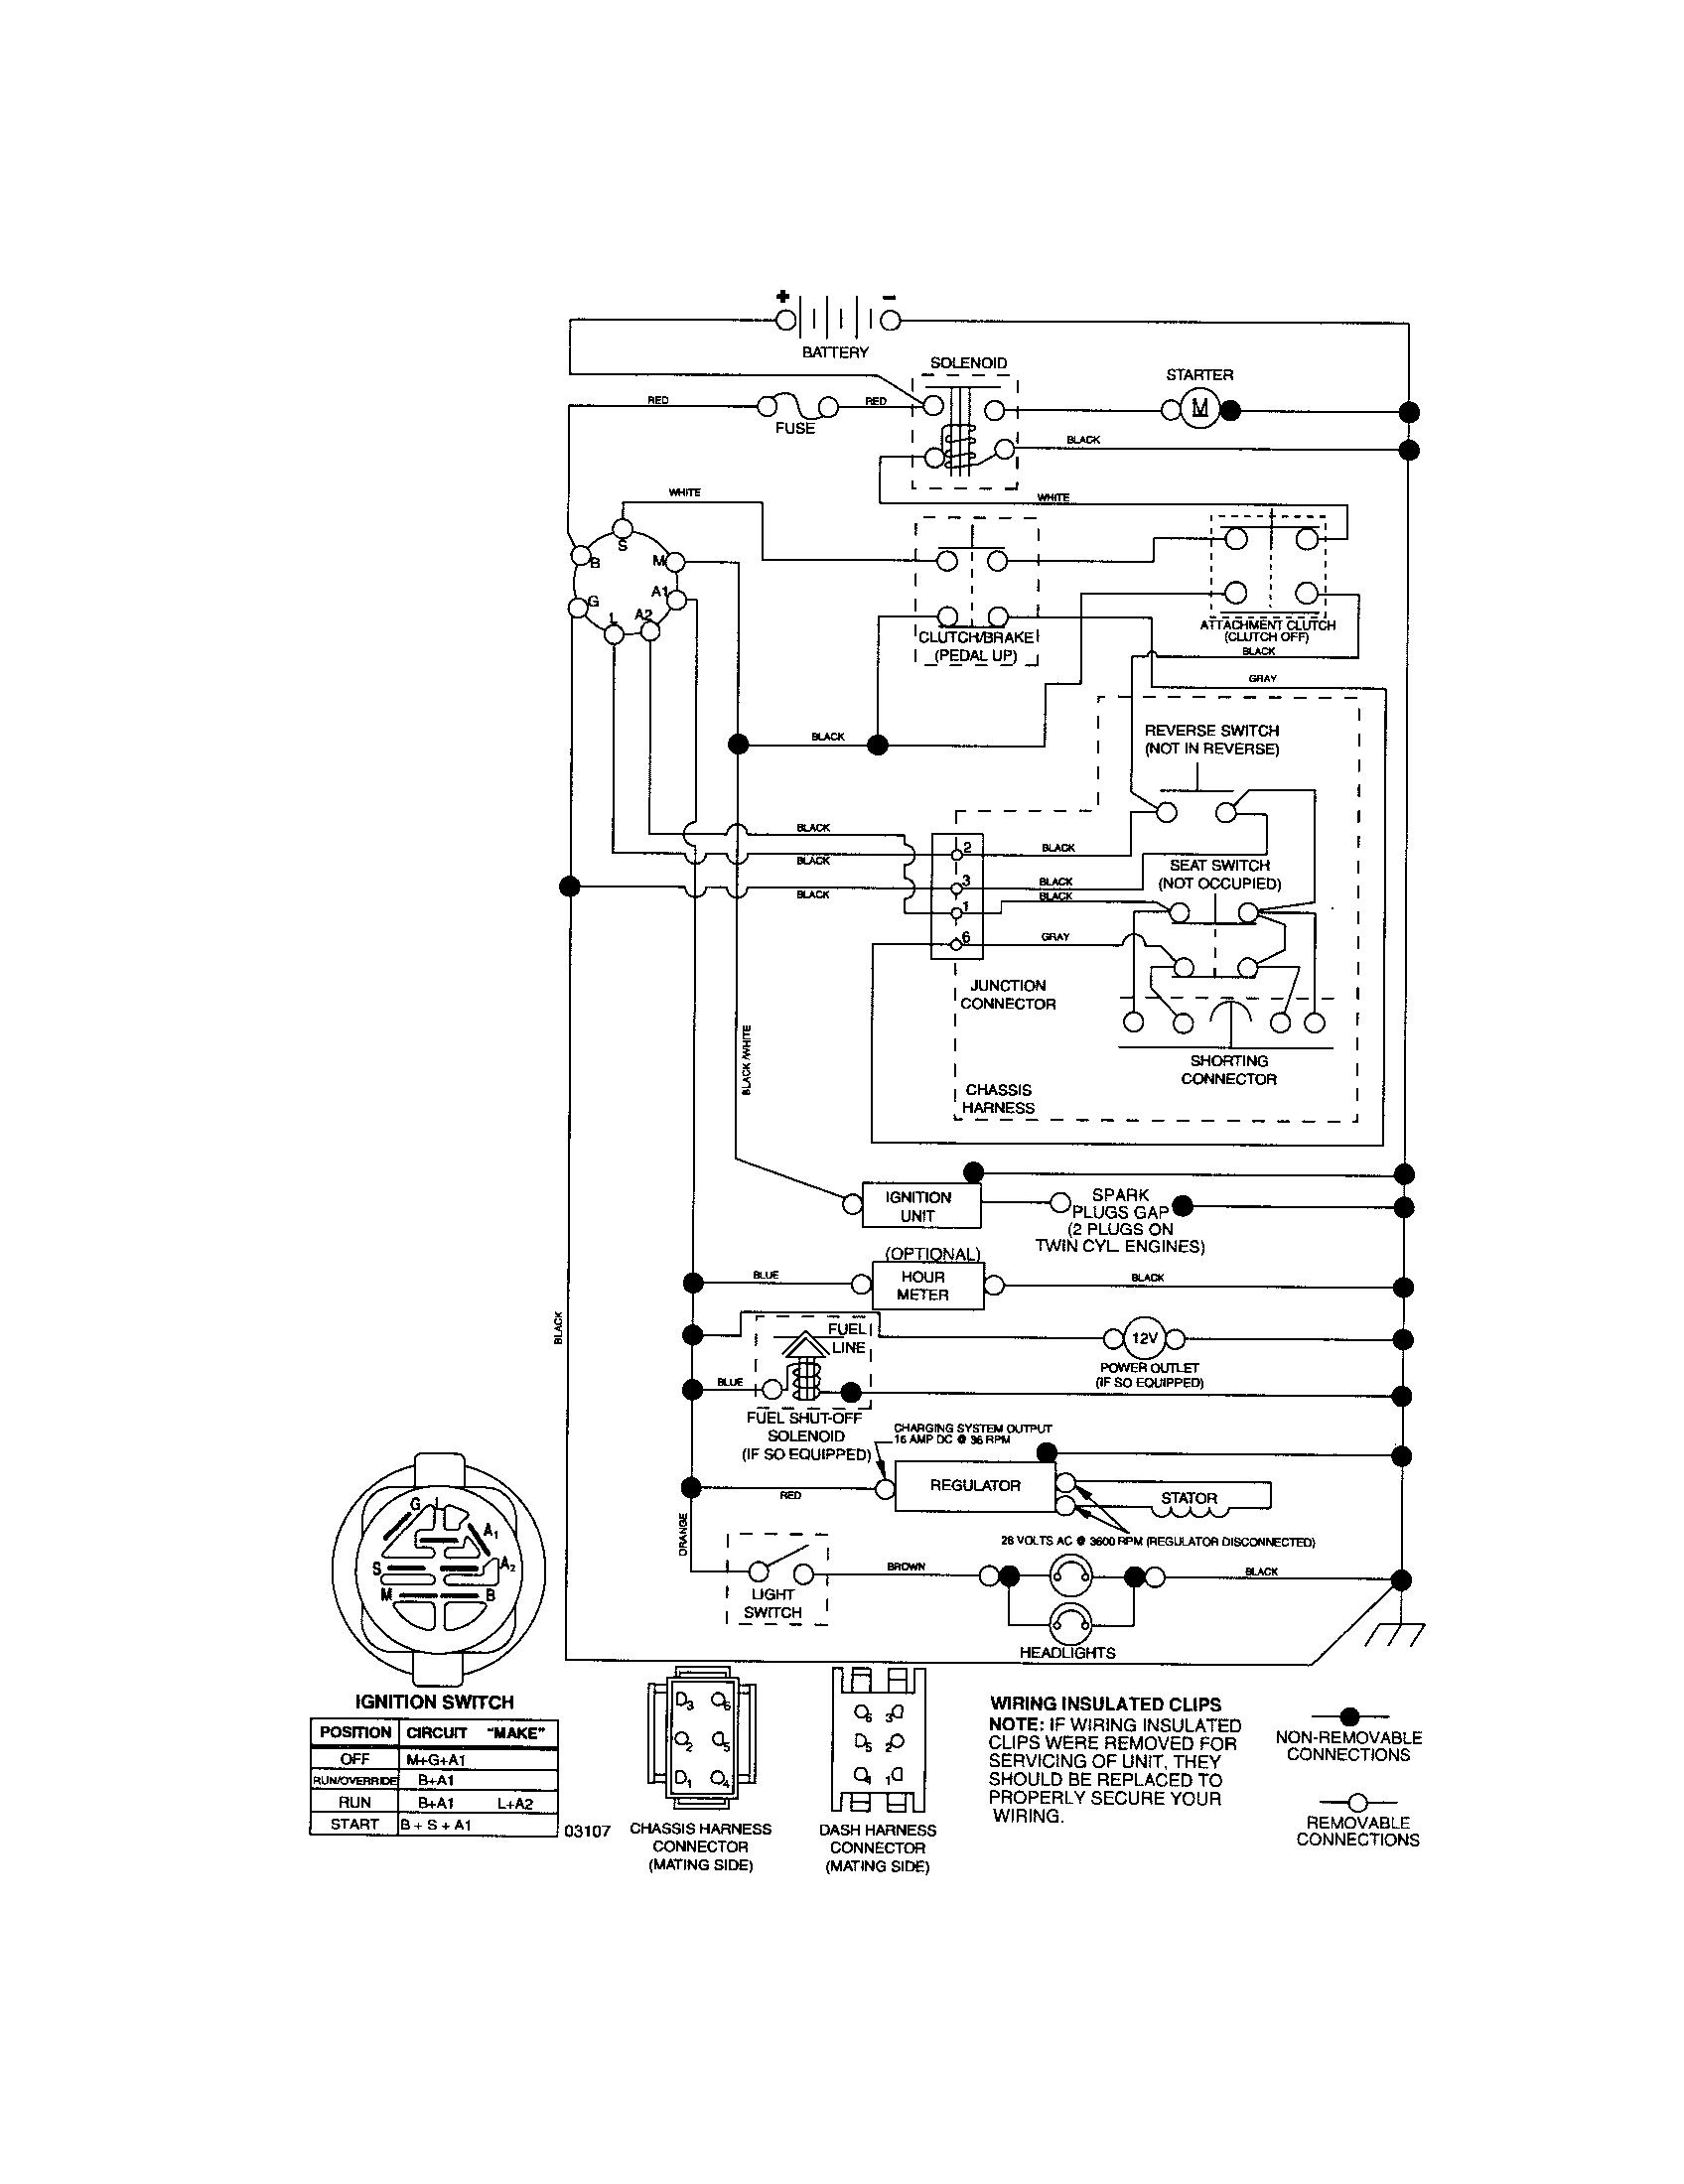 Craftsman Riding Mower Electrical Diagram | Wiring Diagram Craftsman - Wiring Diagram For Craftsman Riding Lawn Mower